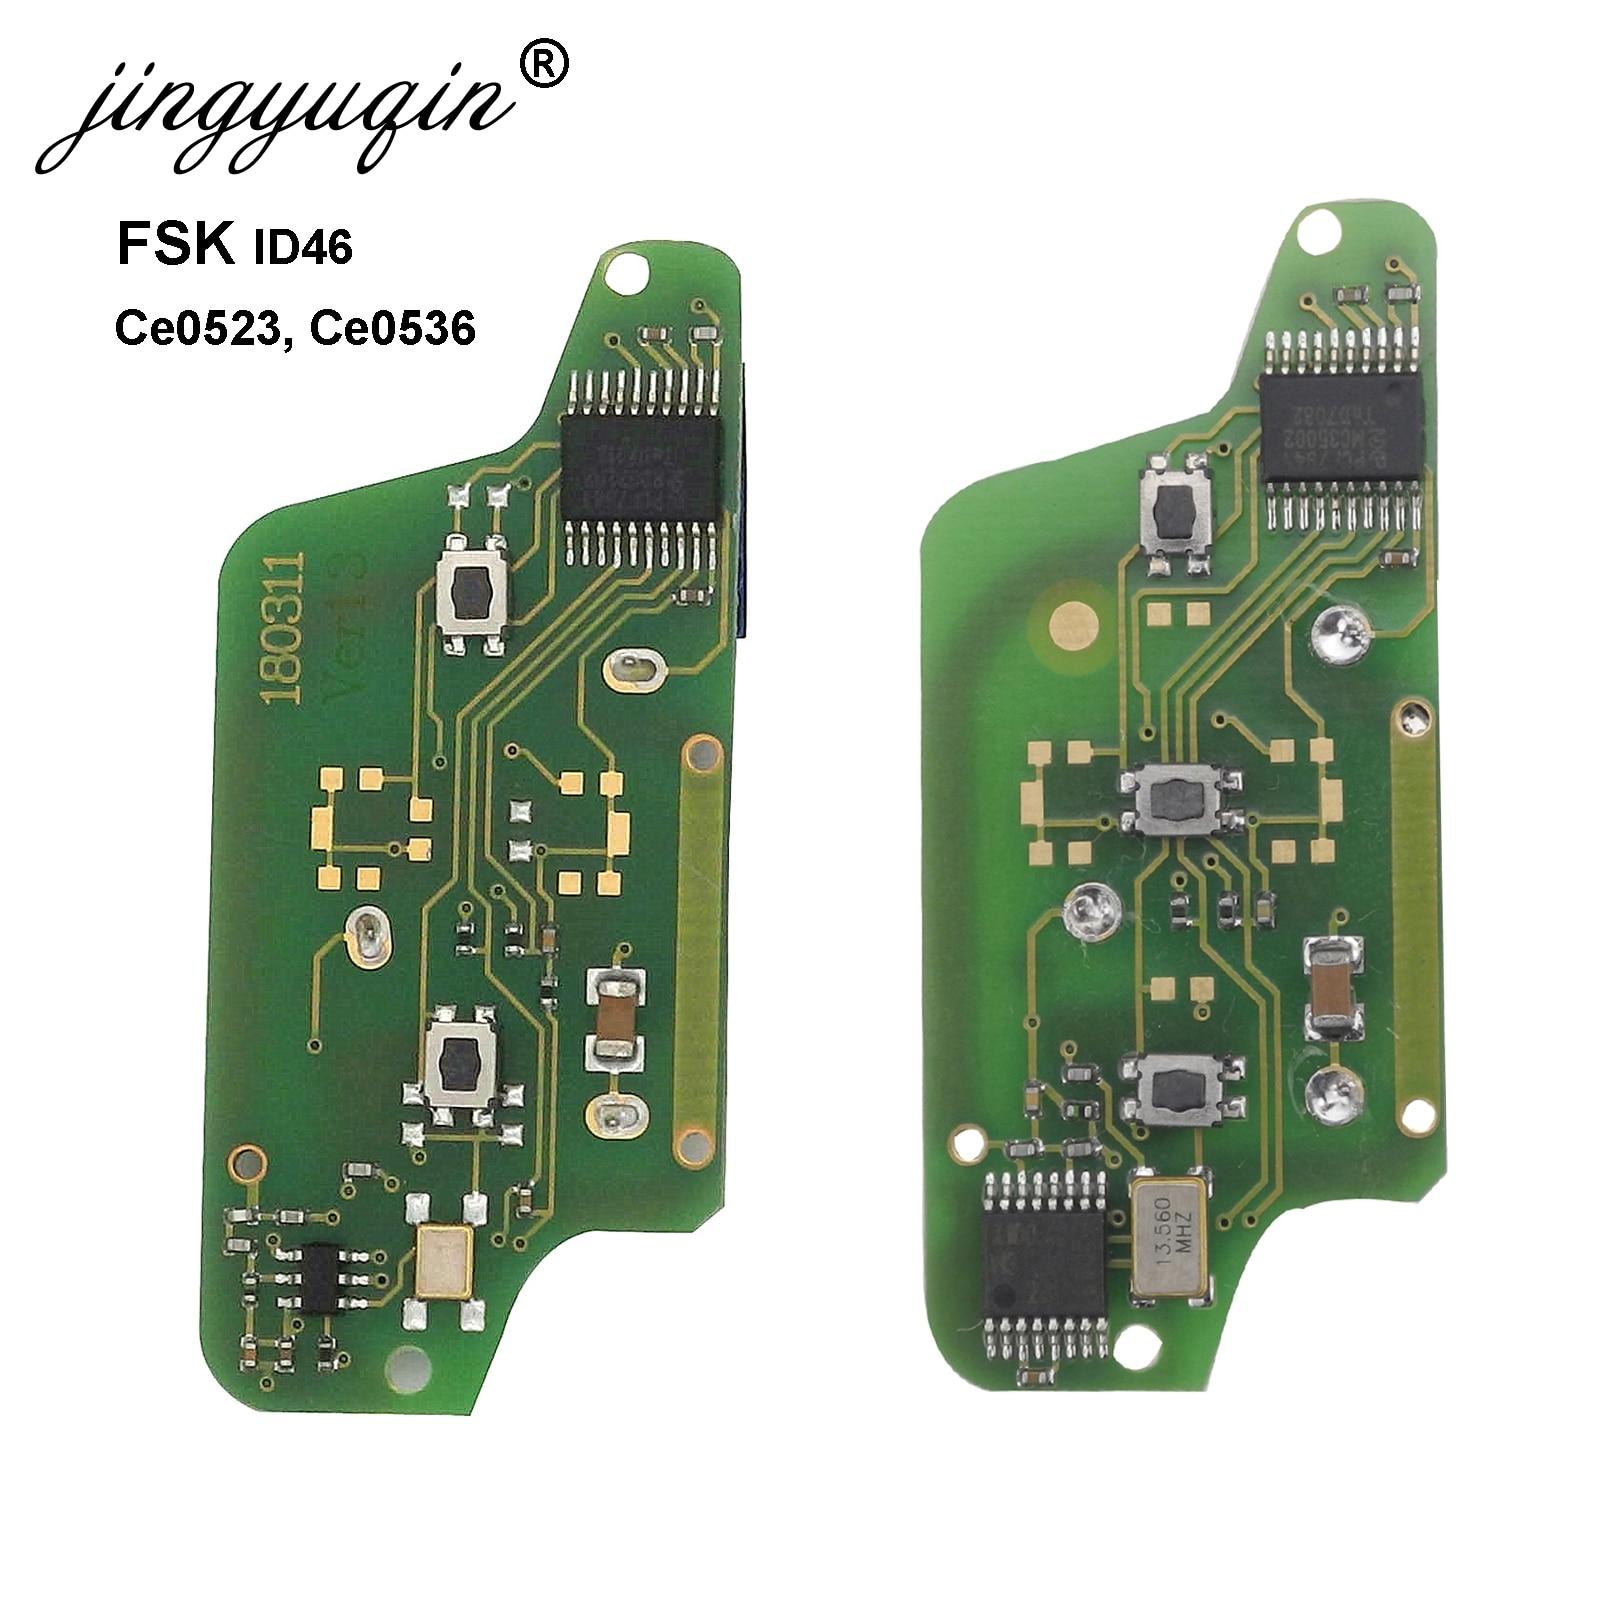 jingyuqin Car Remote FSK Key Board for Peugeot 207 208 307 308 408 Partner CITROEN C2 C3 C4 C5 Berlingo Picasso CE0523 536 2/3B